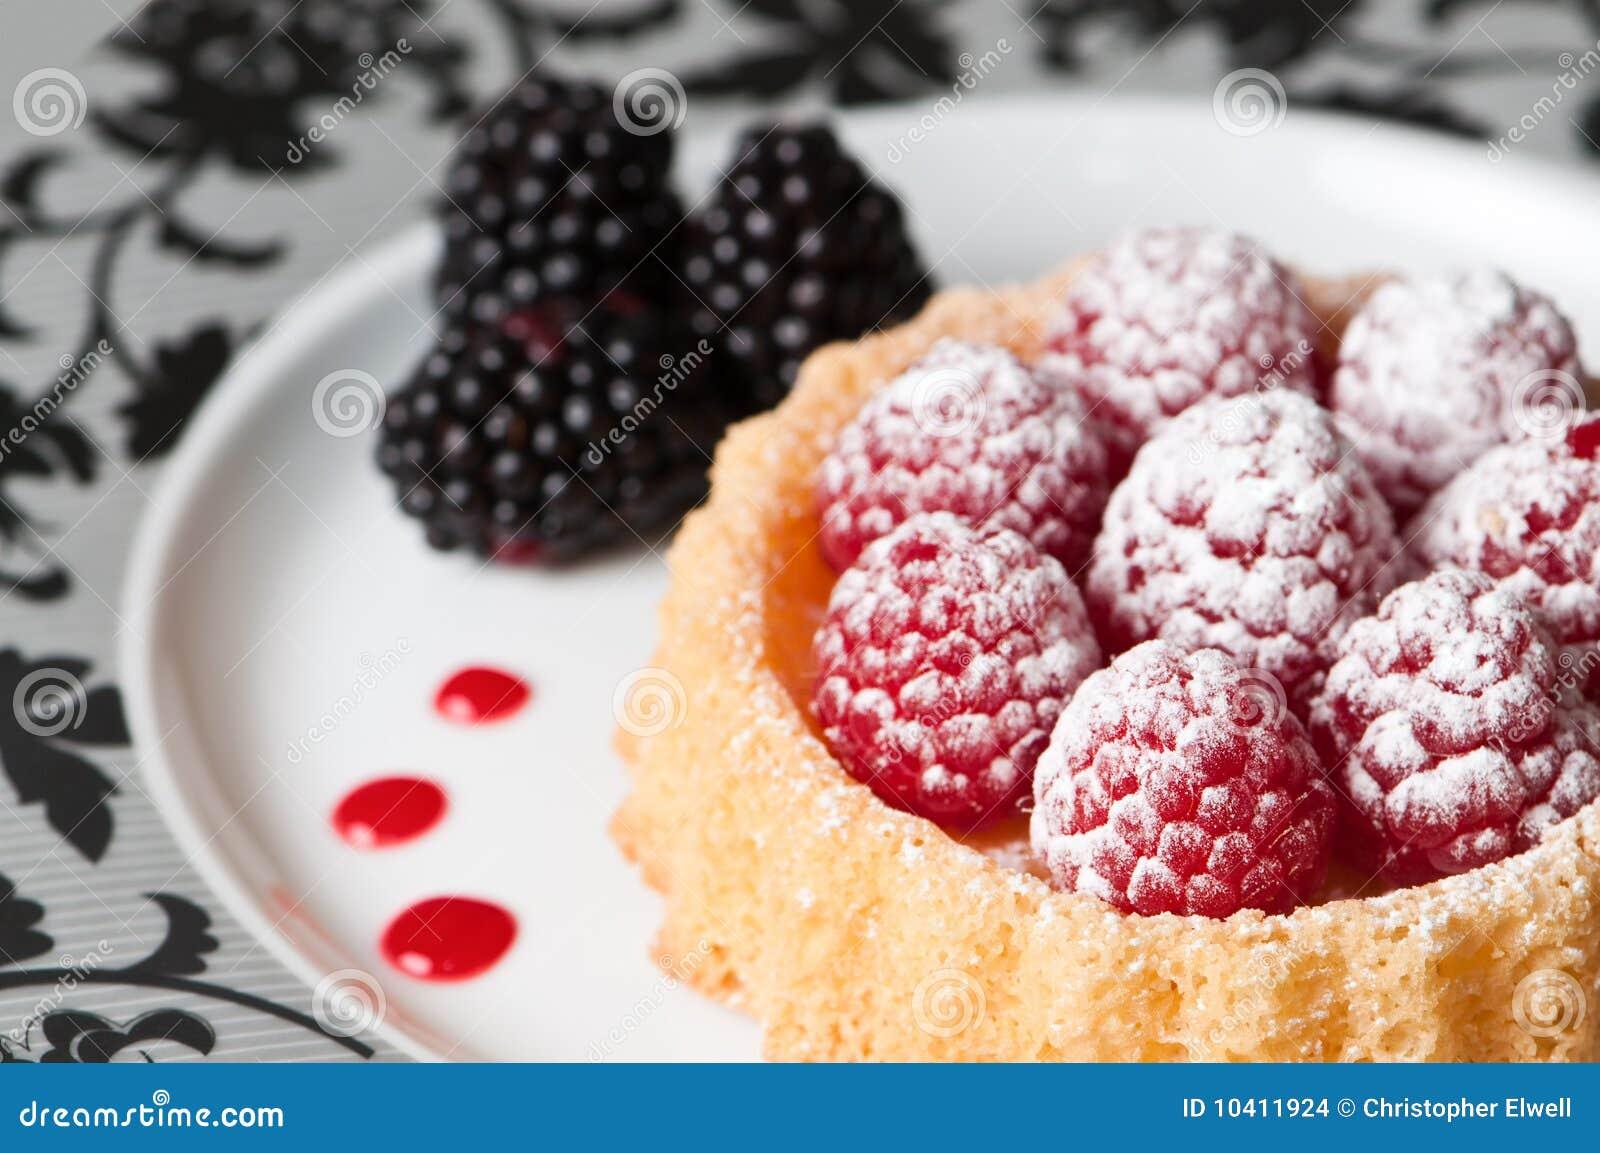 Download Raspberry Dessert stock photo. Image of plate, fine, flan - 10411924